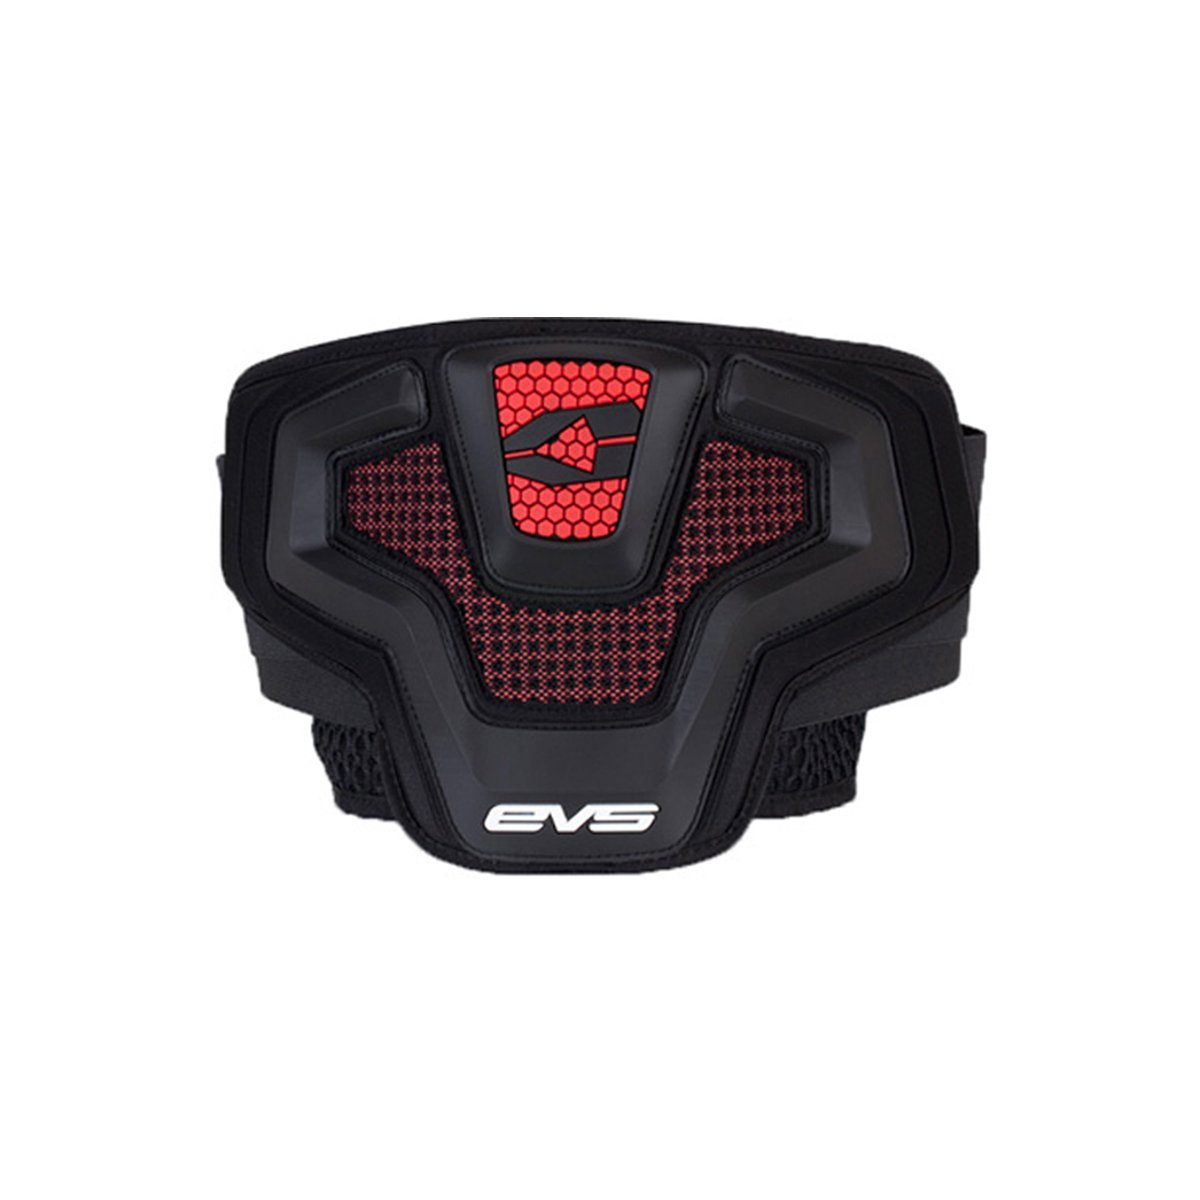 EVS BB1 Youth Ballistic Belt MotoX Motorcycle Body Armor - Black